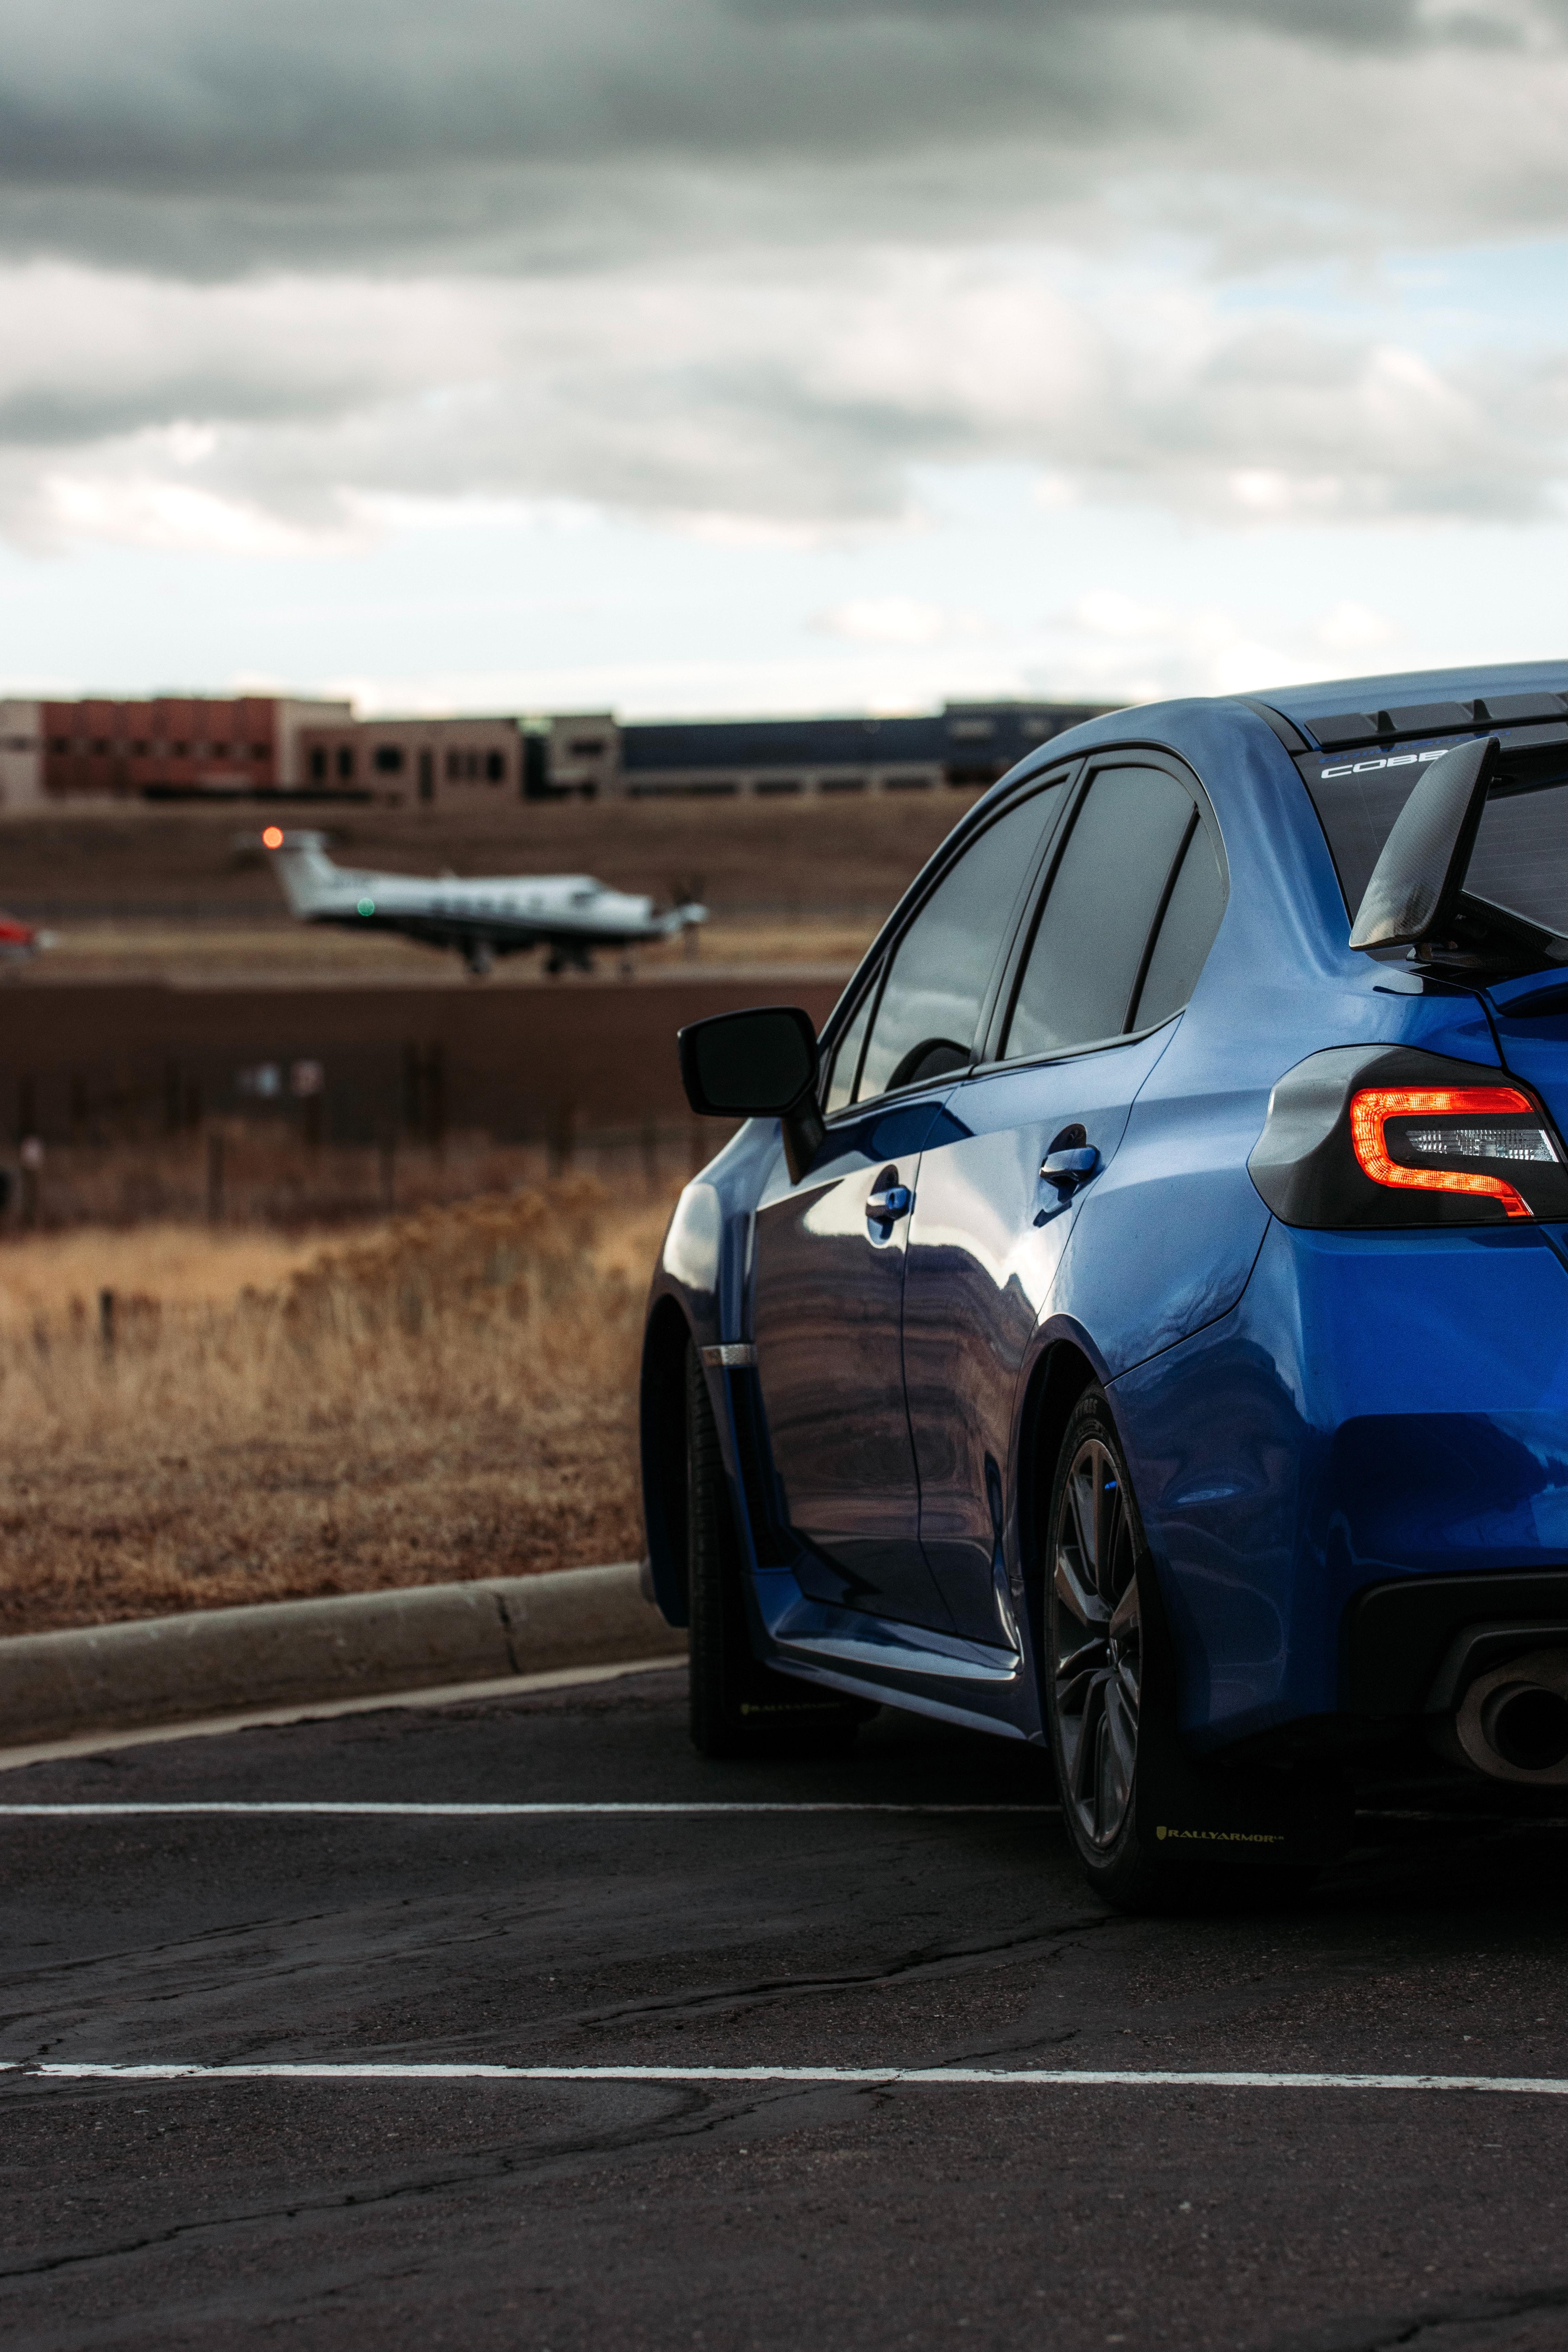 70815 download wallpaper Cars, Subaru, Car, Airport screensavers and pictures for free